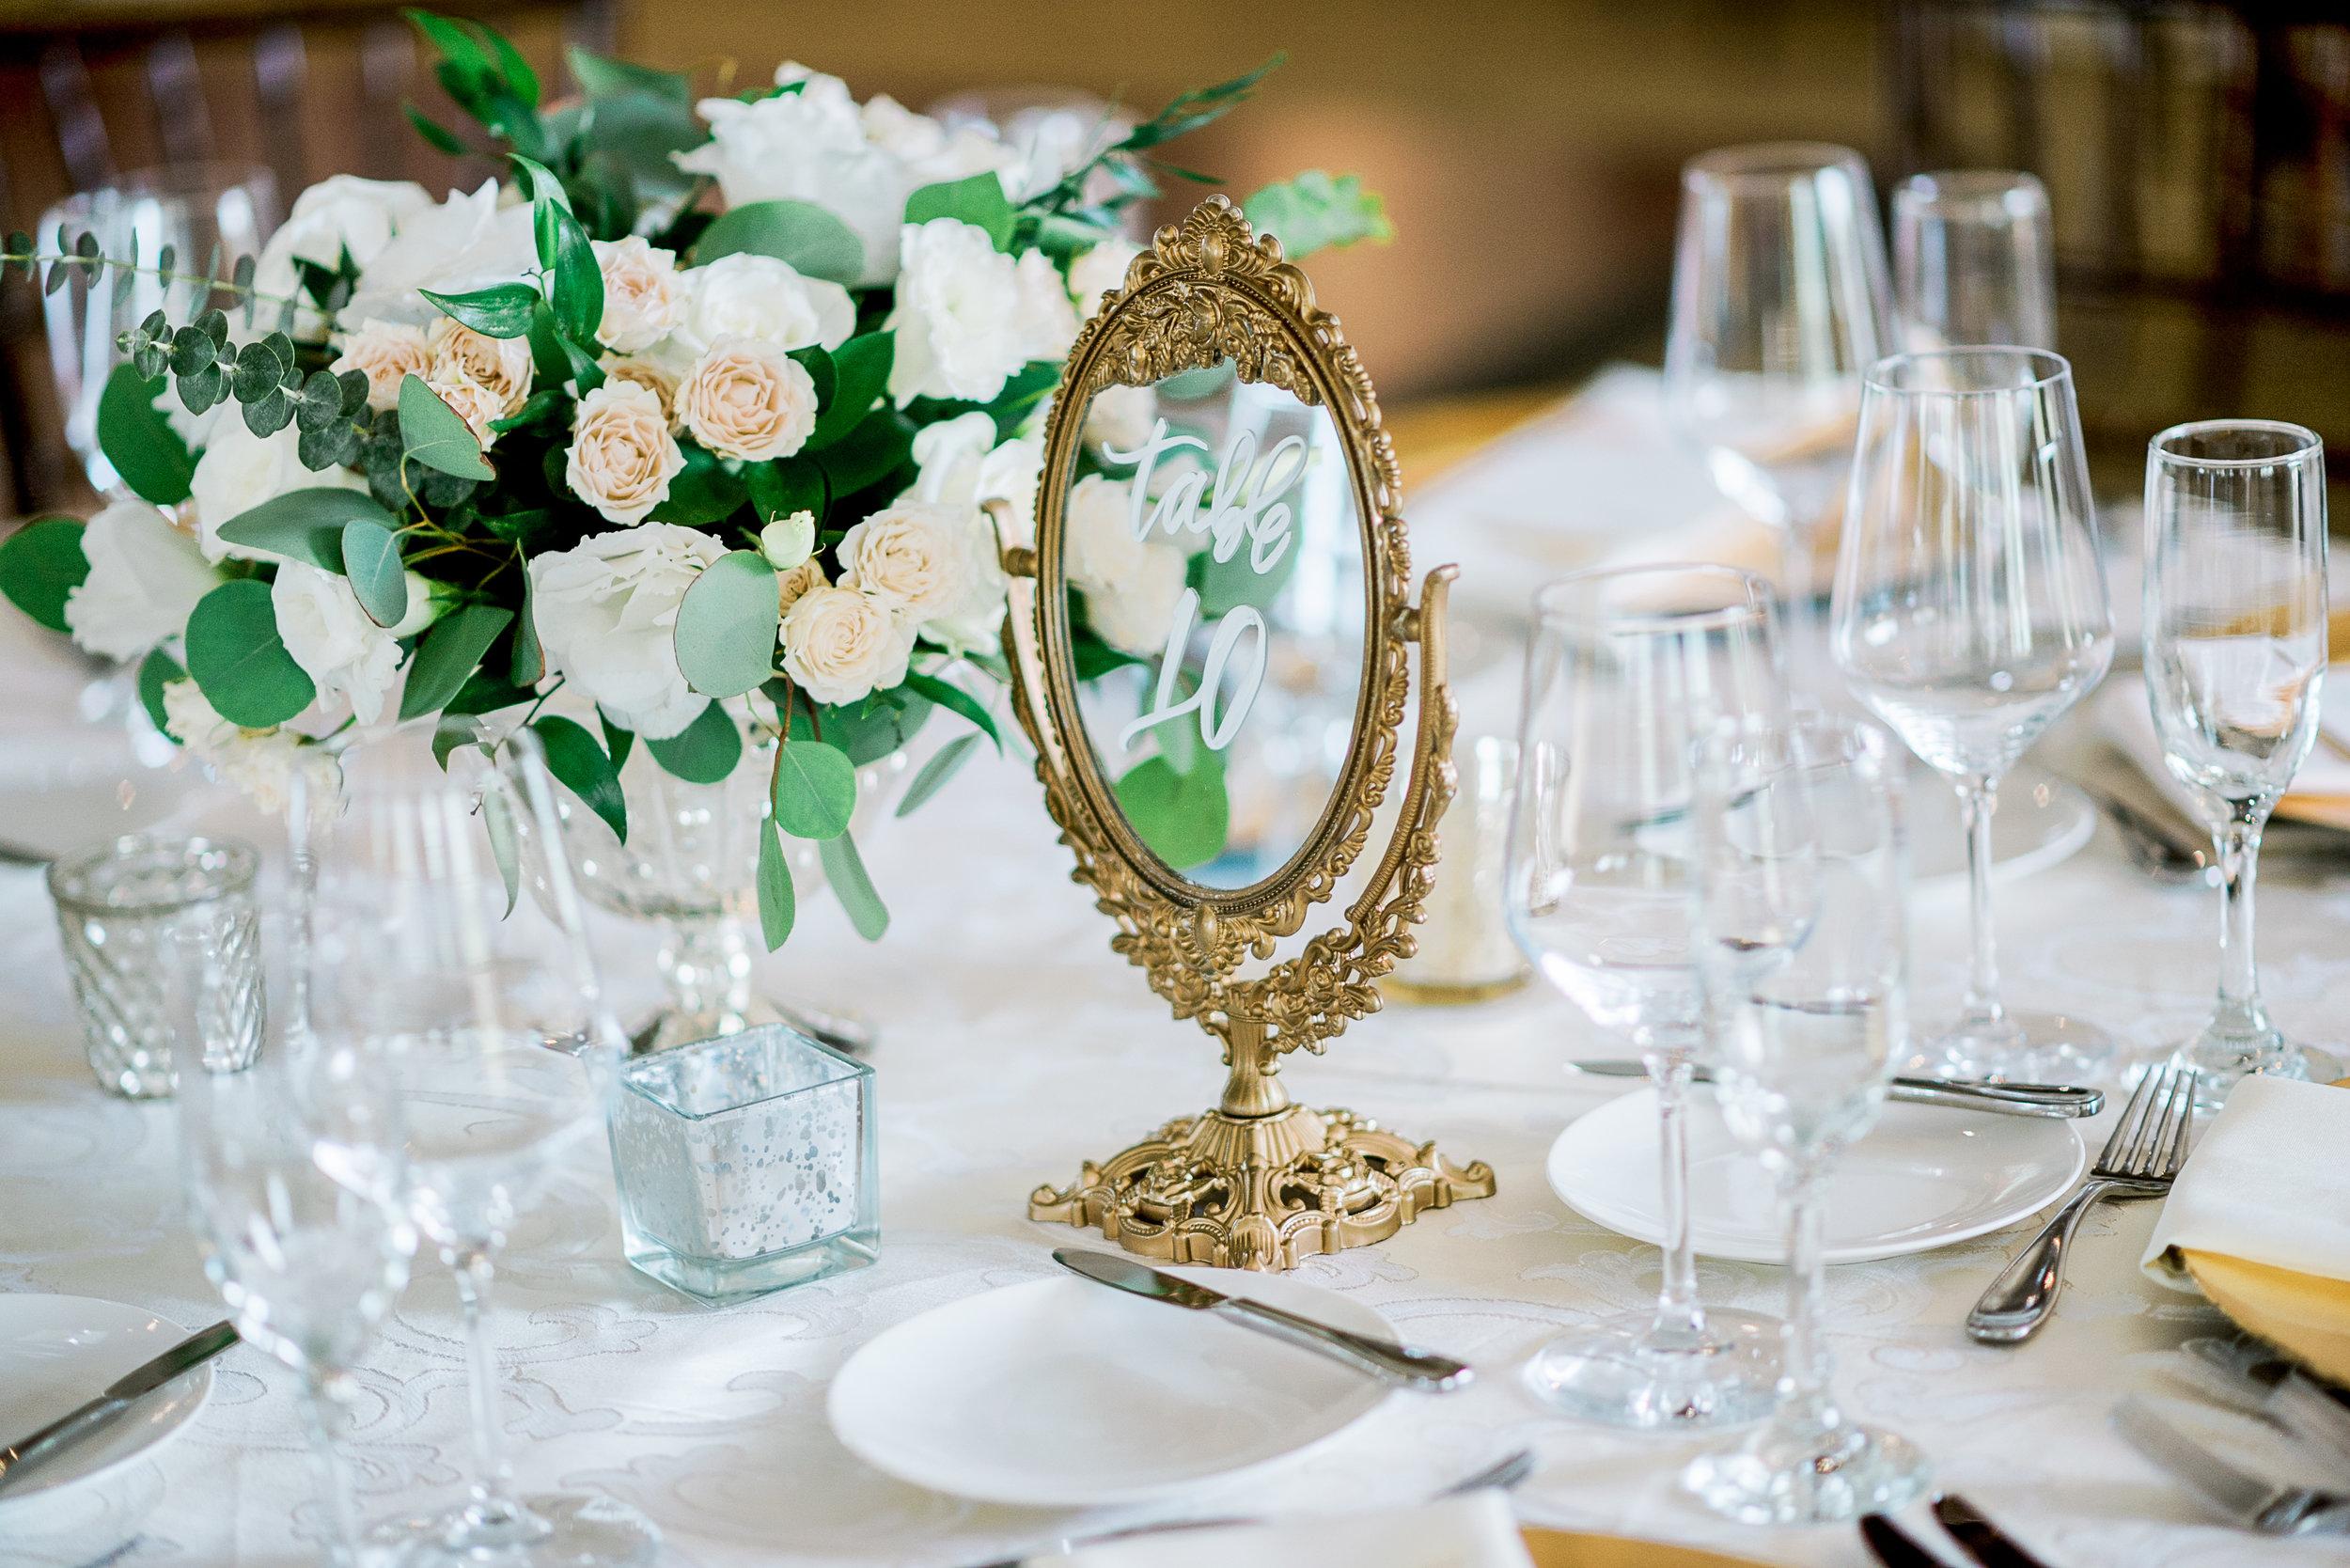 Denise Carlos Wedding - Carissa Woo Photography-0496.jpg